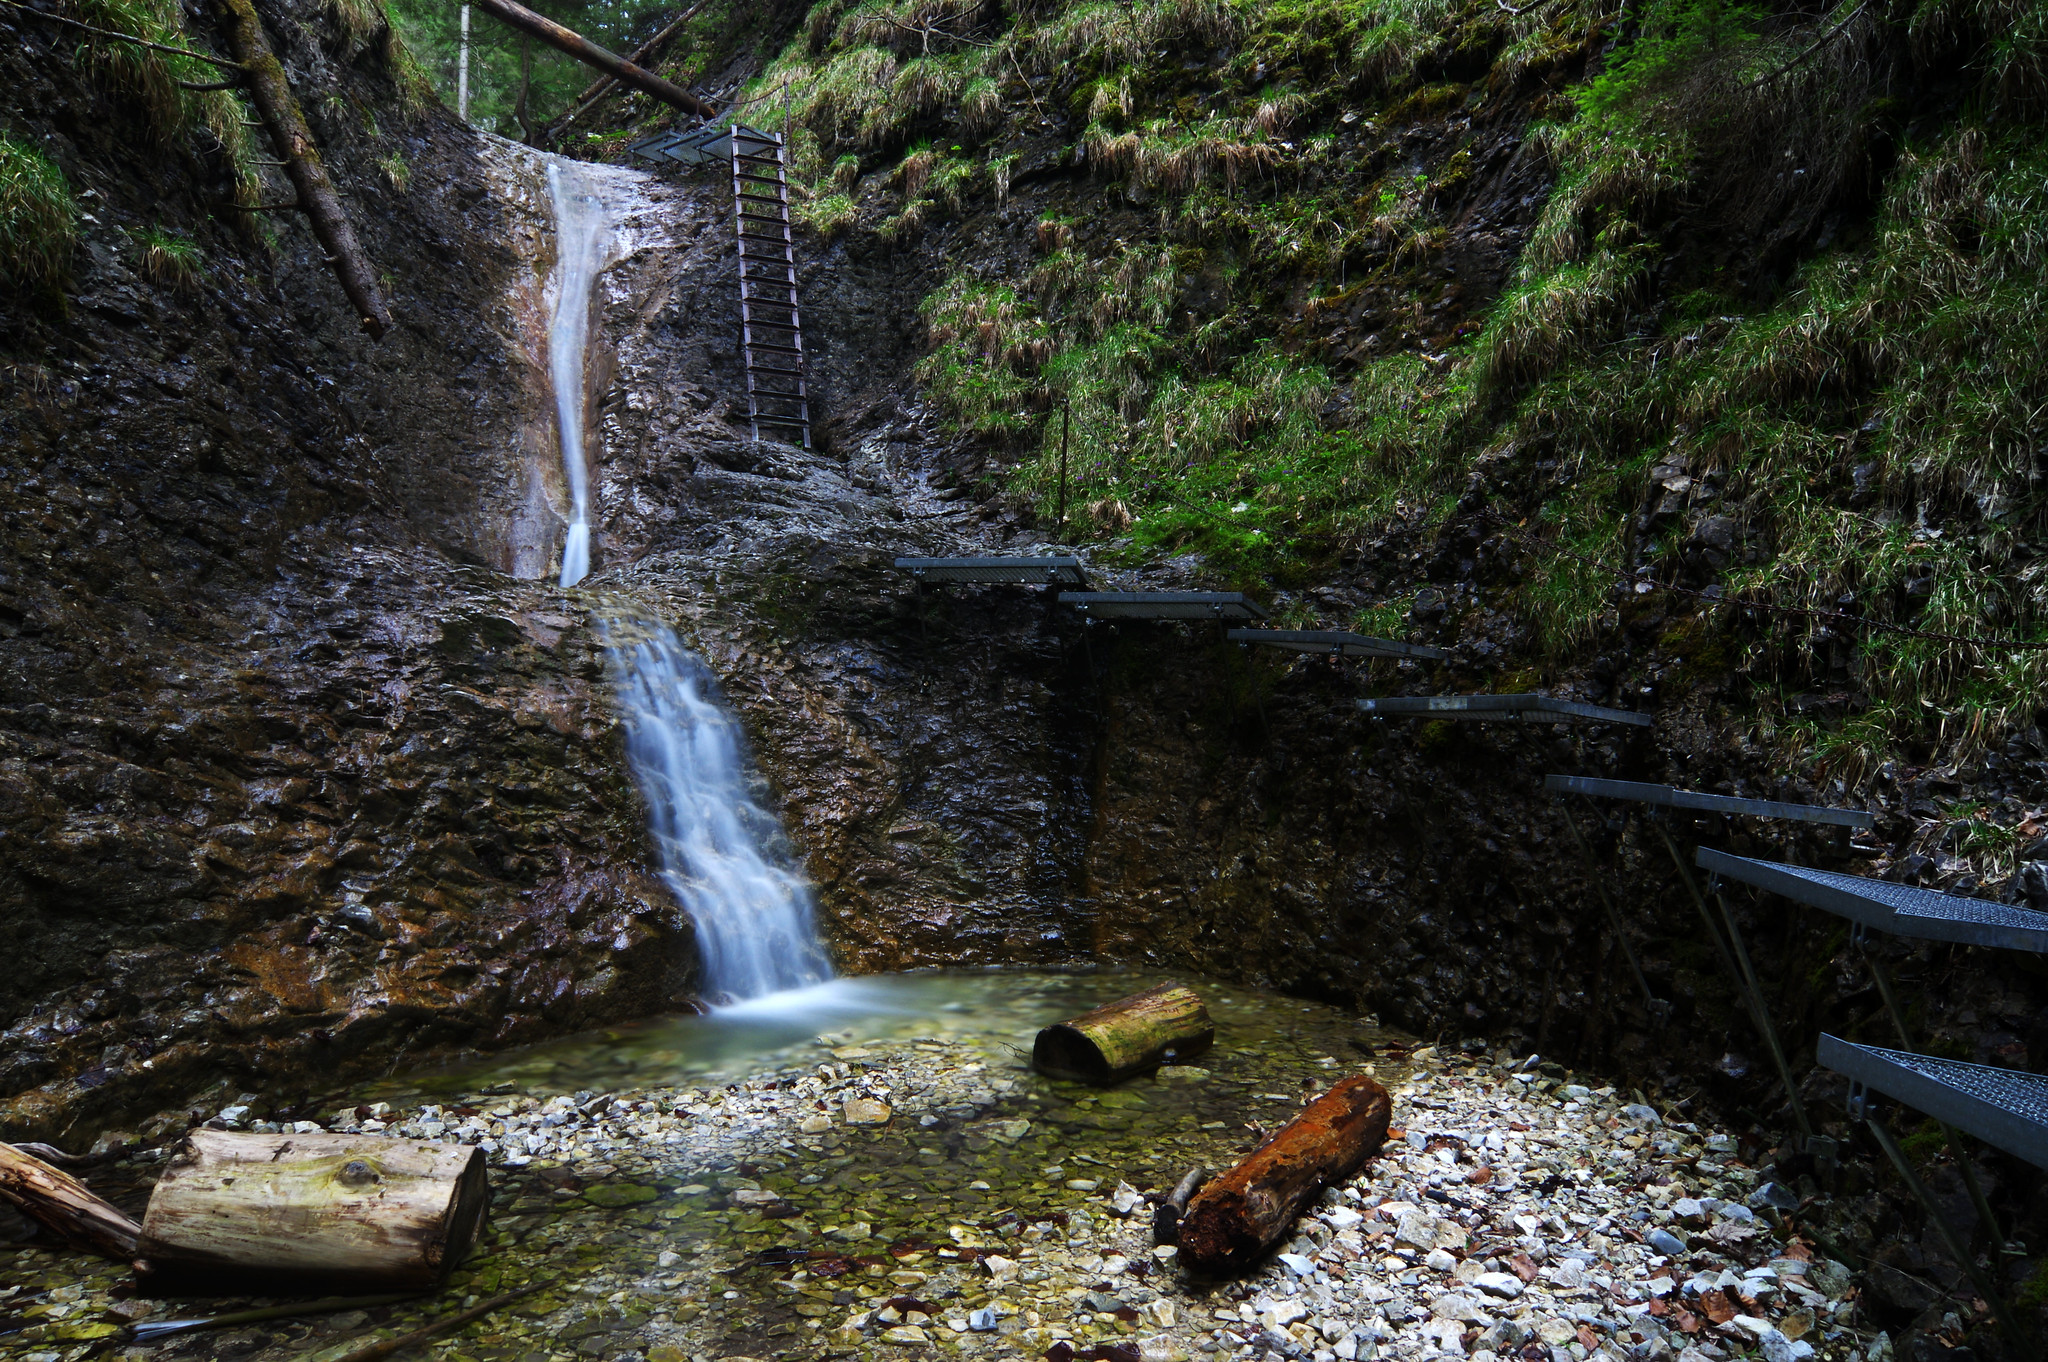 Korytový vodopád waterfall in Piecky gorge